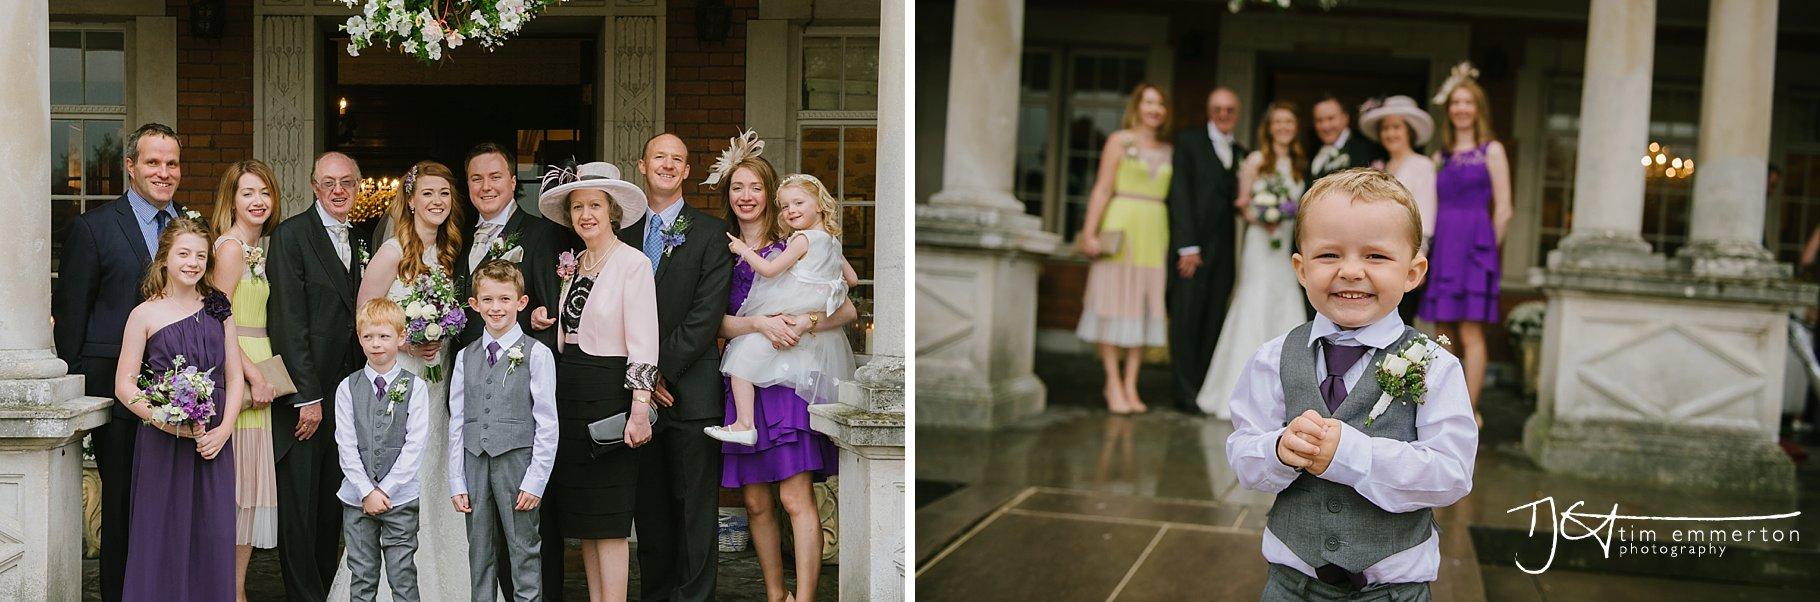 Eaves-Hall-Wedding-Photographer-065.jpg